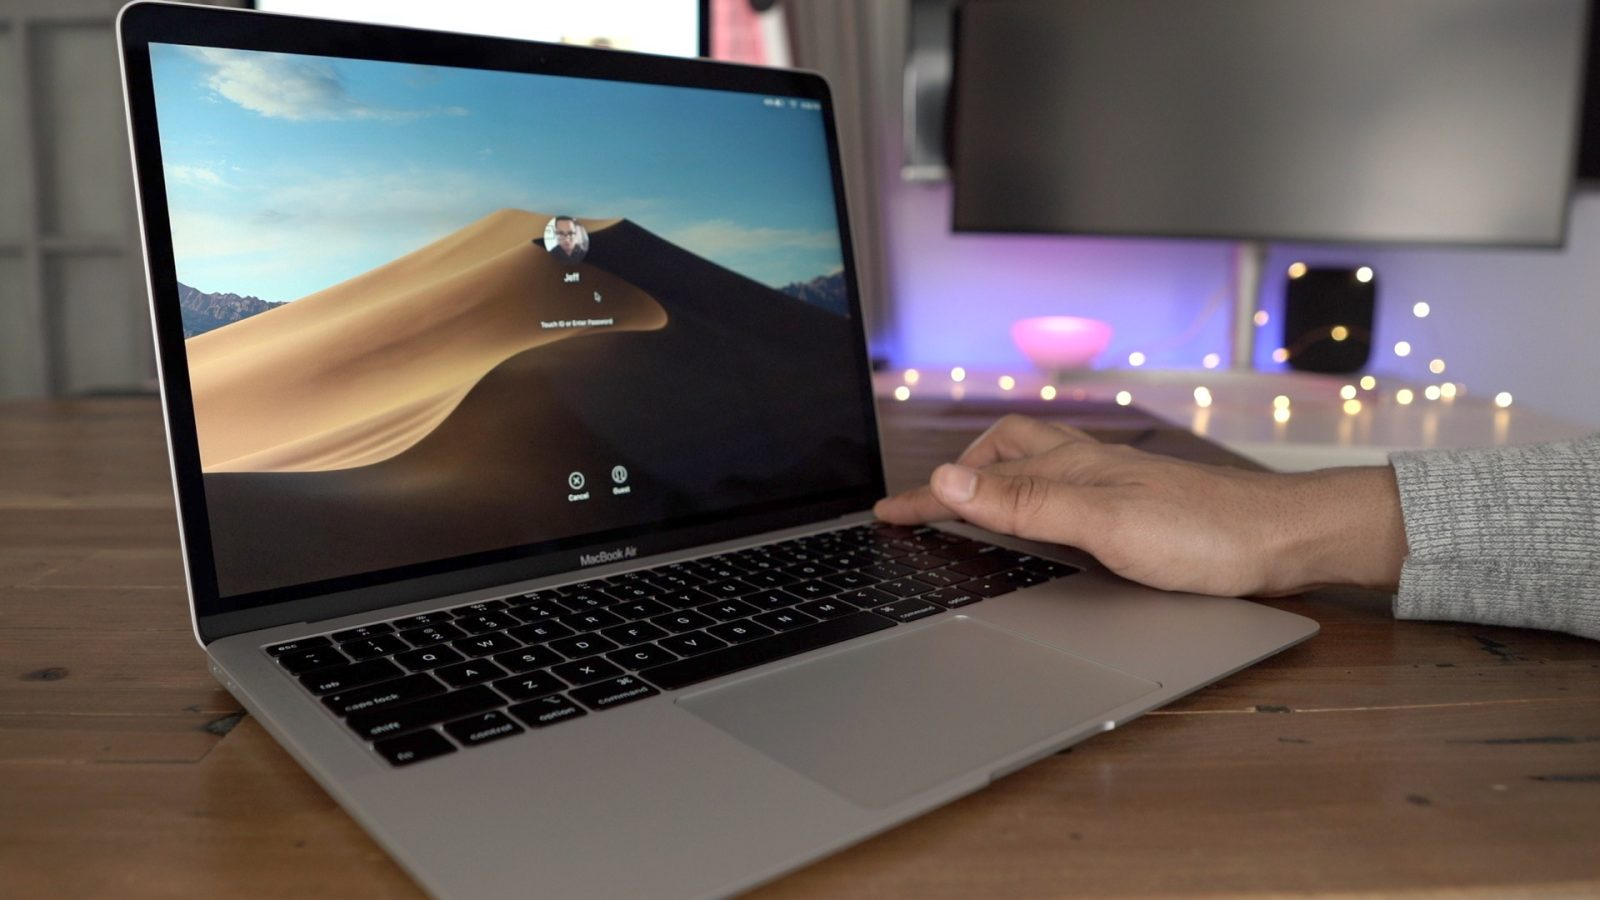 Some 2018 MacBook Air users experiencing poor FaceTime HD